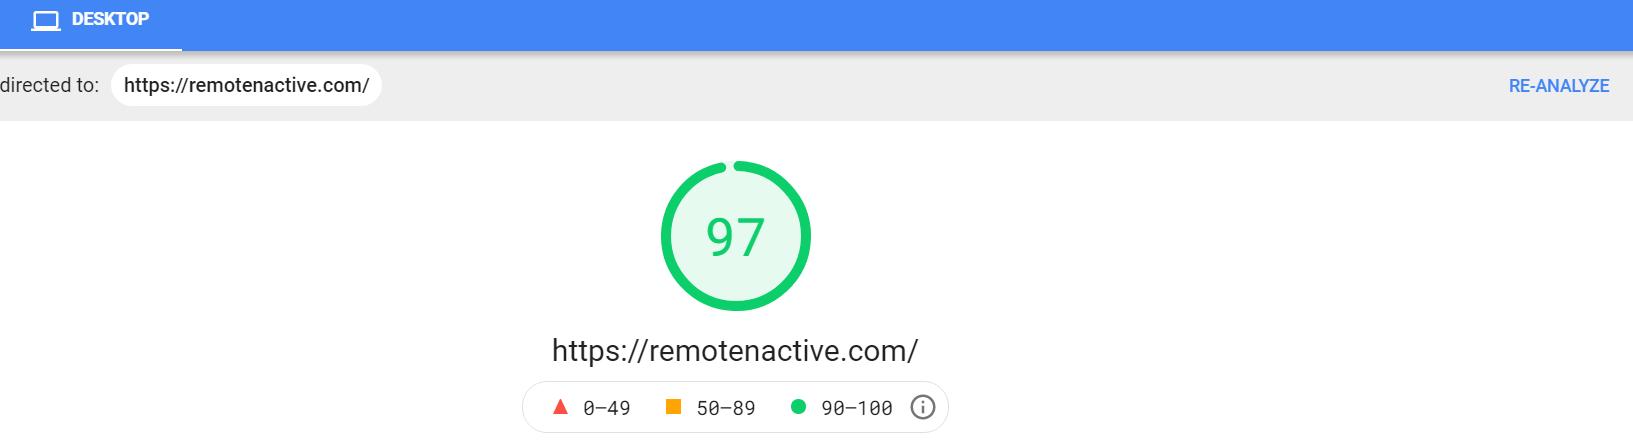 https://i.ibb.co/RPvXZNS/remotenactive-desktop.png